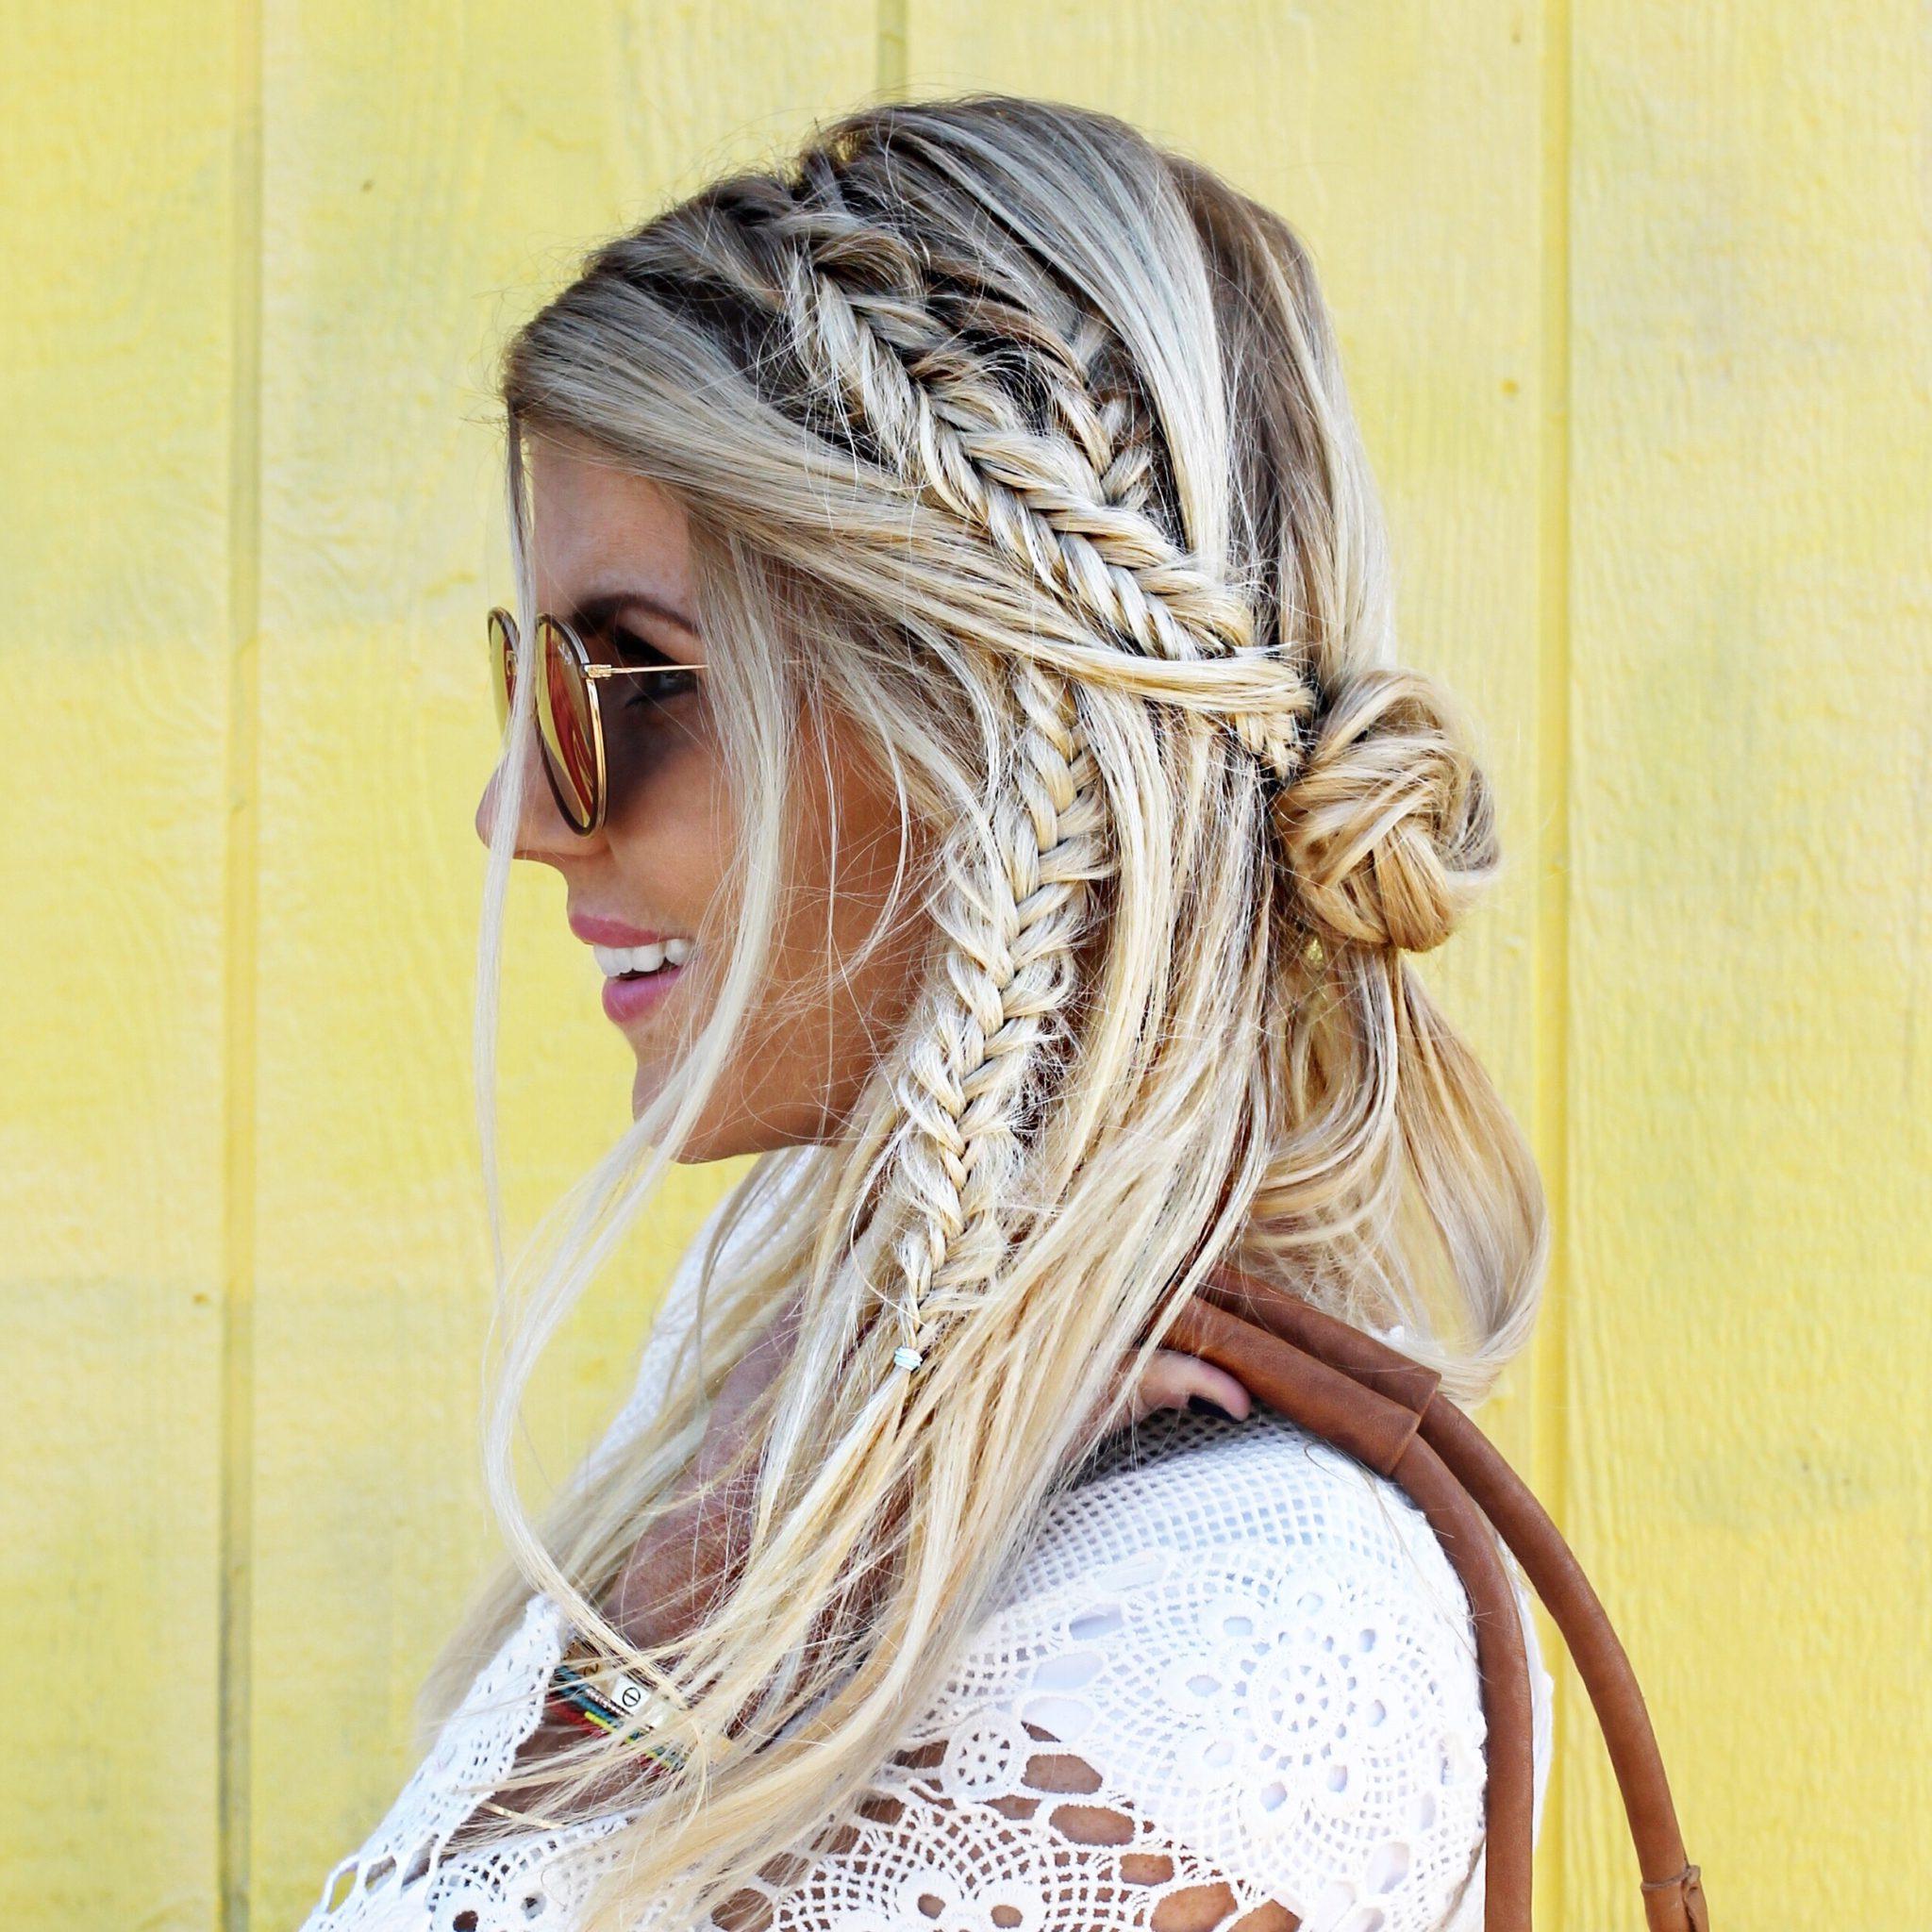 Bohemian Fishtail Braid Tutorial: A Video Plus The Regarding Trendy Boho Fishtail Braid Hairstyles (View 17 of 20)